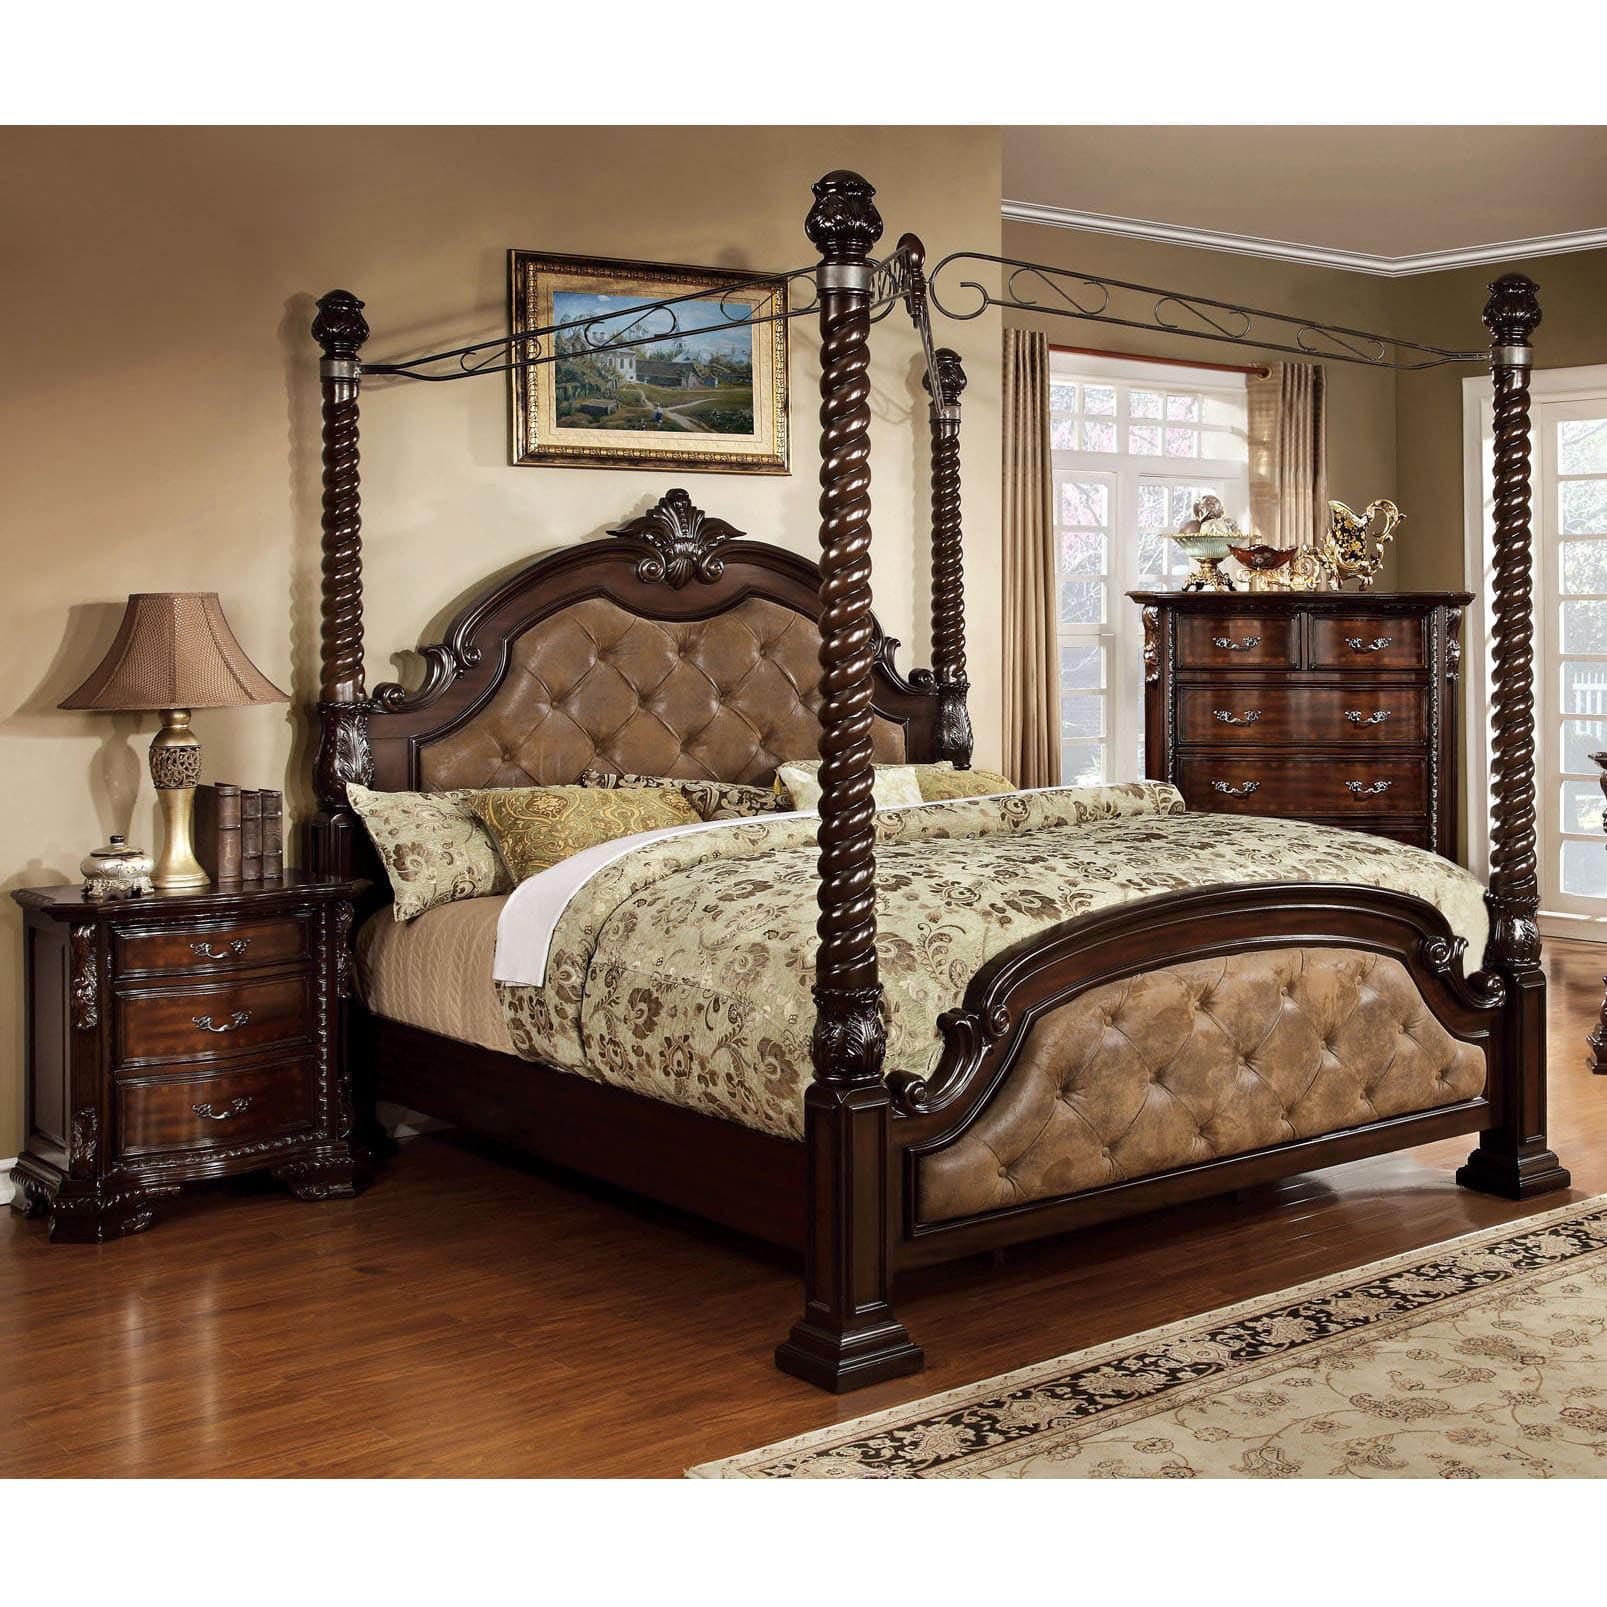 Furniture Of America Kassania Traditional Poster 3 Piece Canopy Bedroom Set Walmart Com Walmart Com